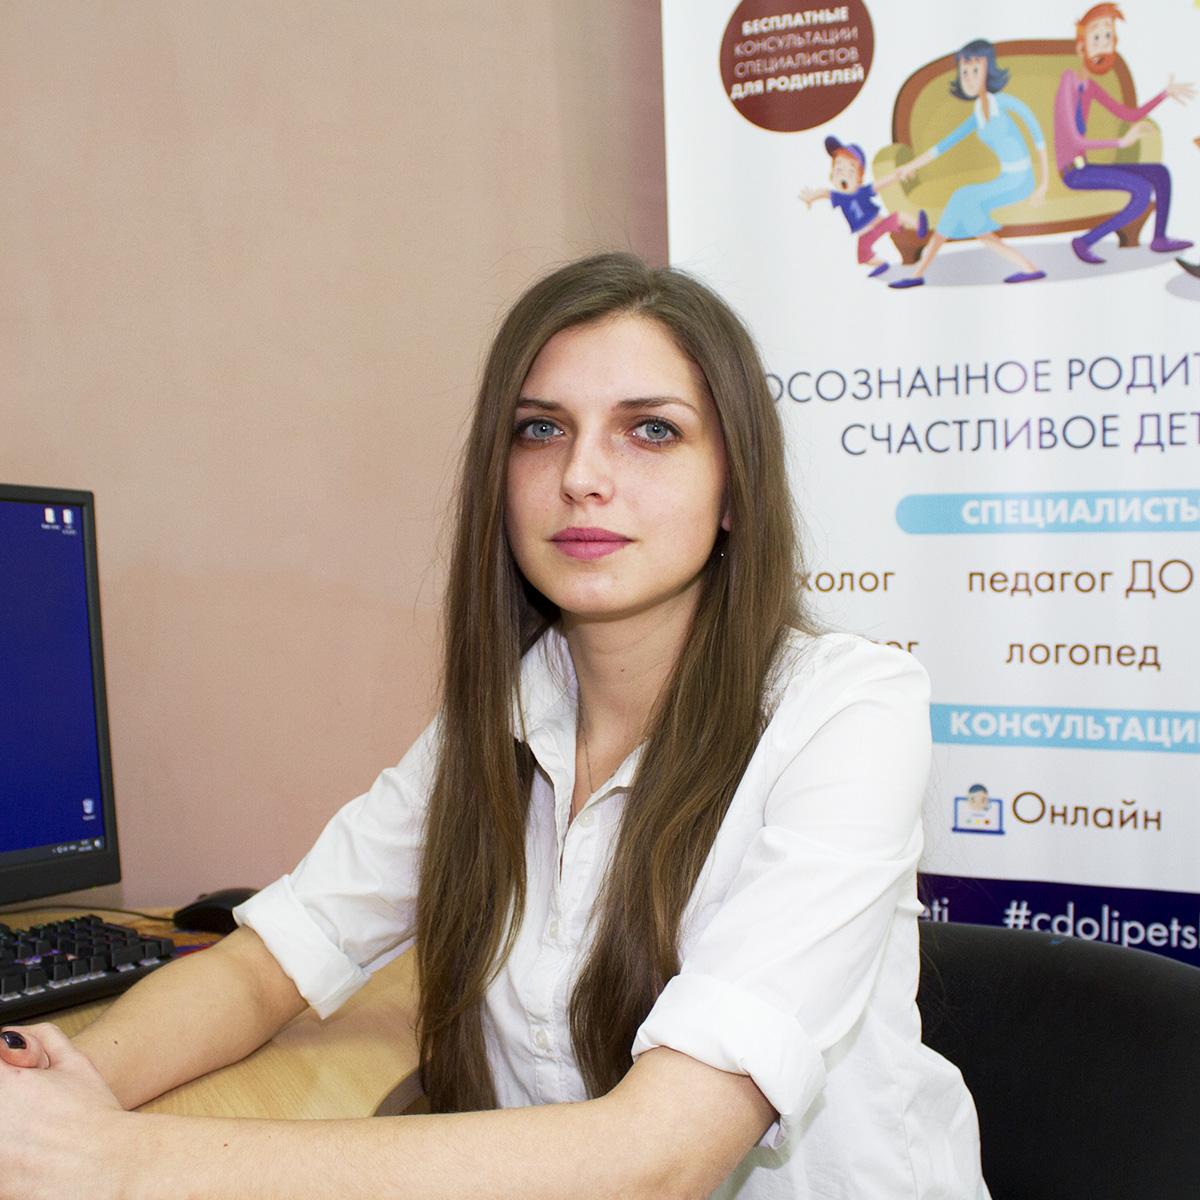 Владимирова Надежда Сергеевна